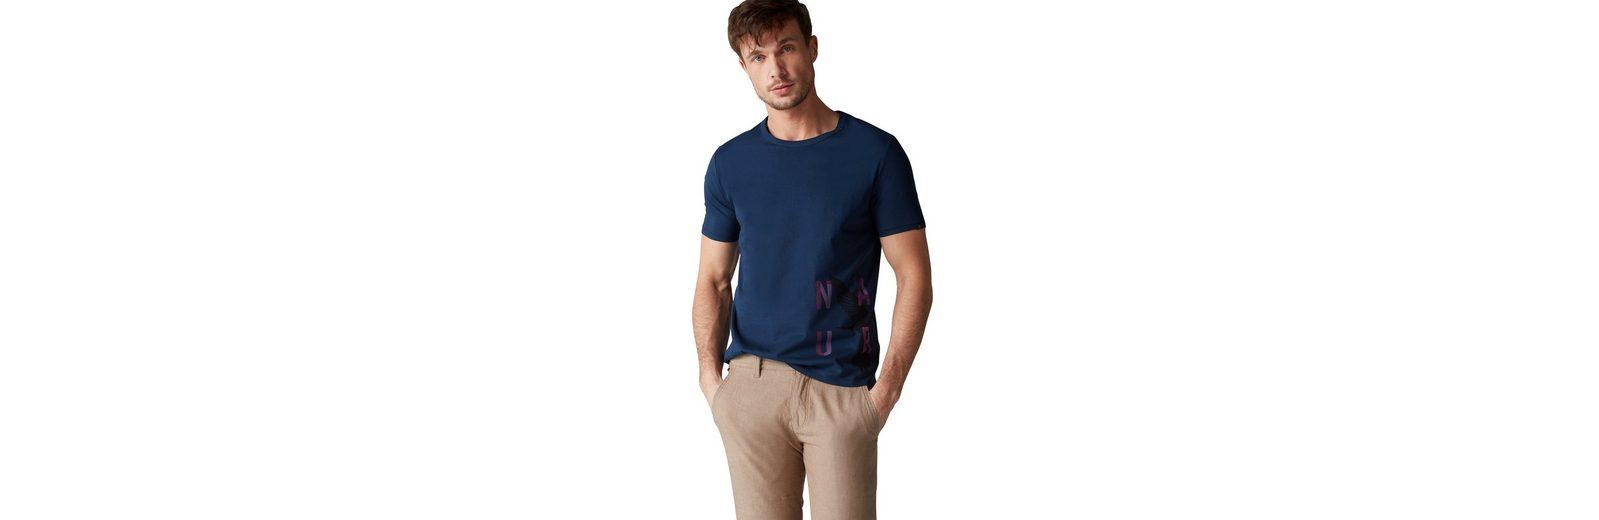 Marc O'polo Marc T O'polo T shirt shirt pE1F6